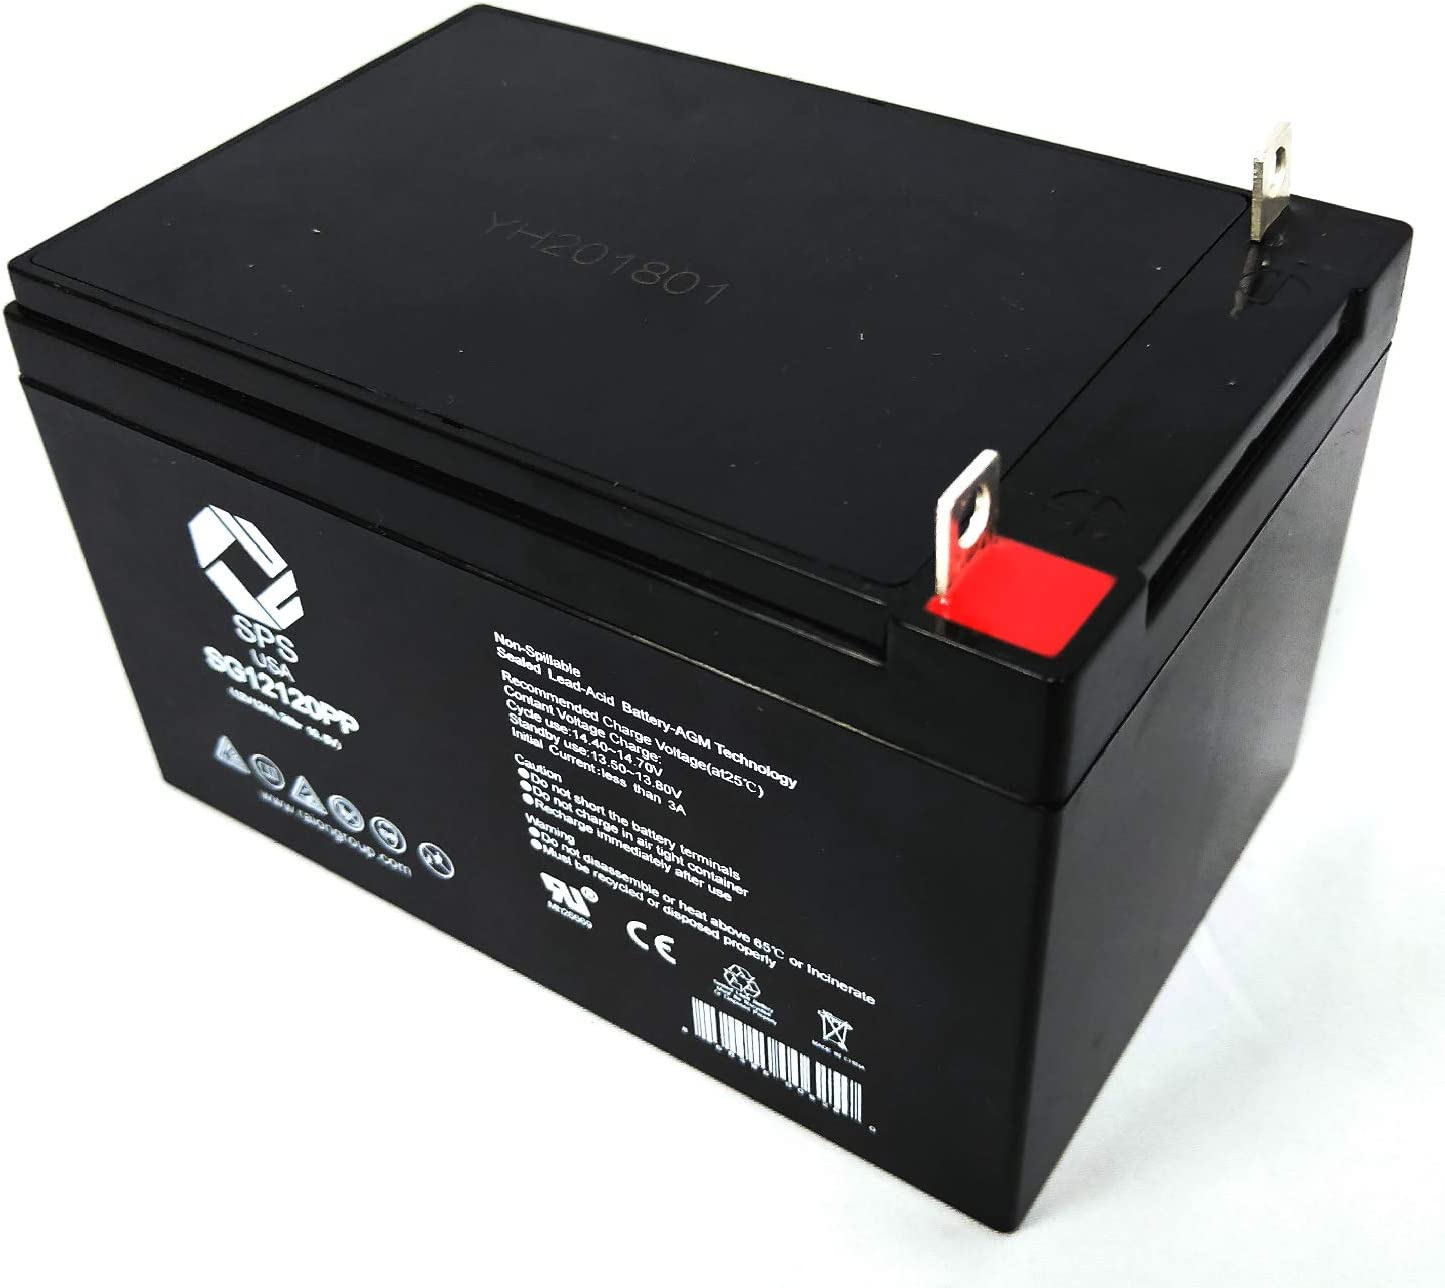 SPS Brand 12V 12Ah Replacement Battery for Diehard SCH12-12C-6 Pack 1